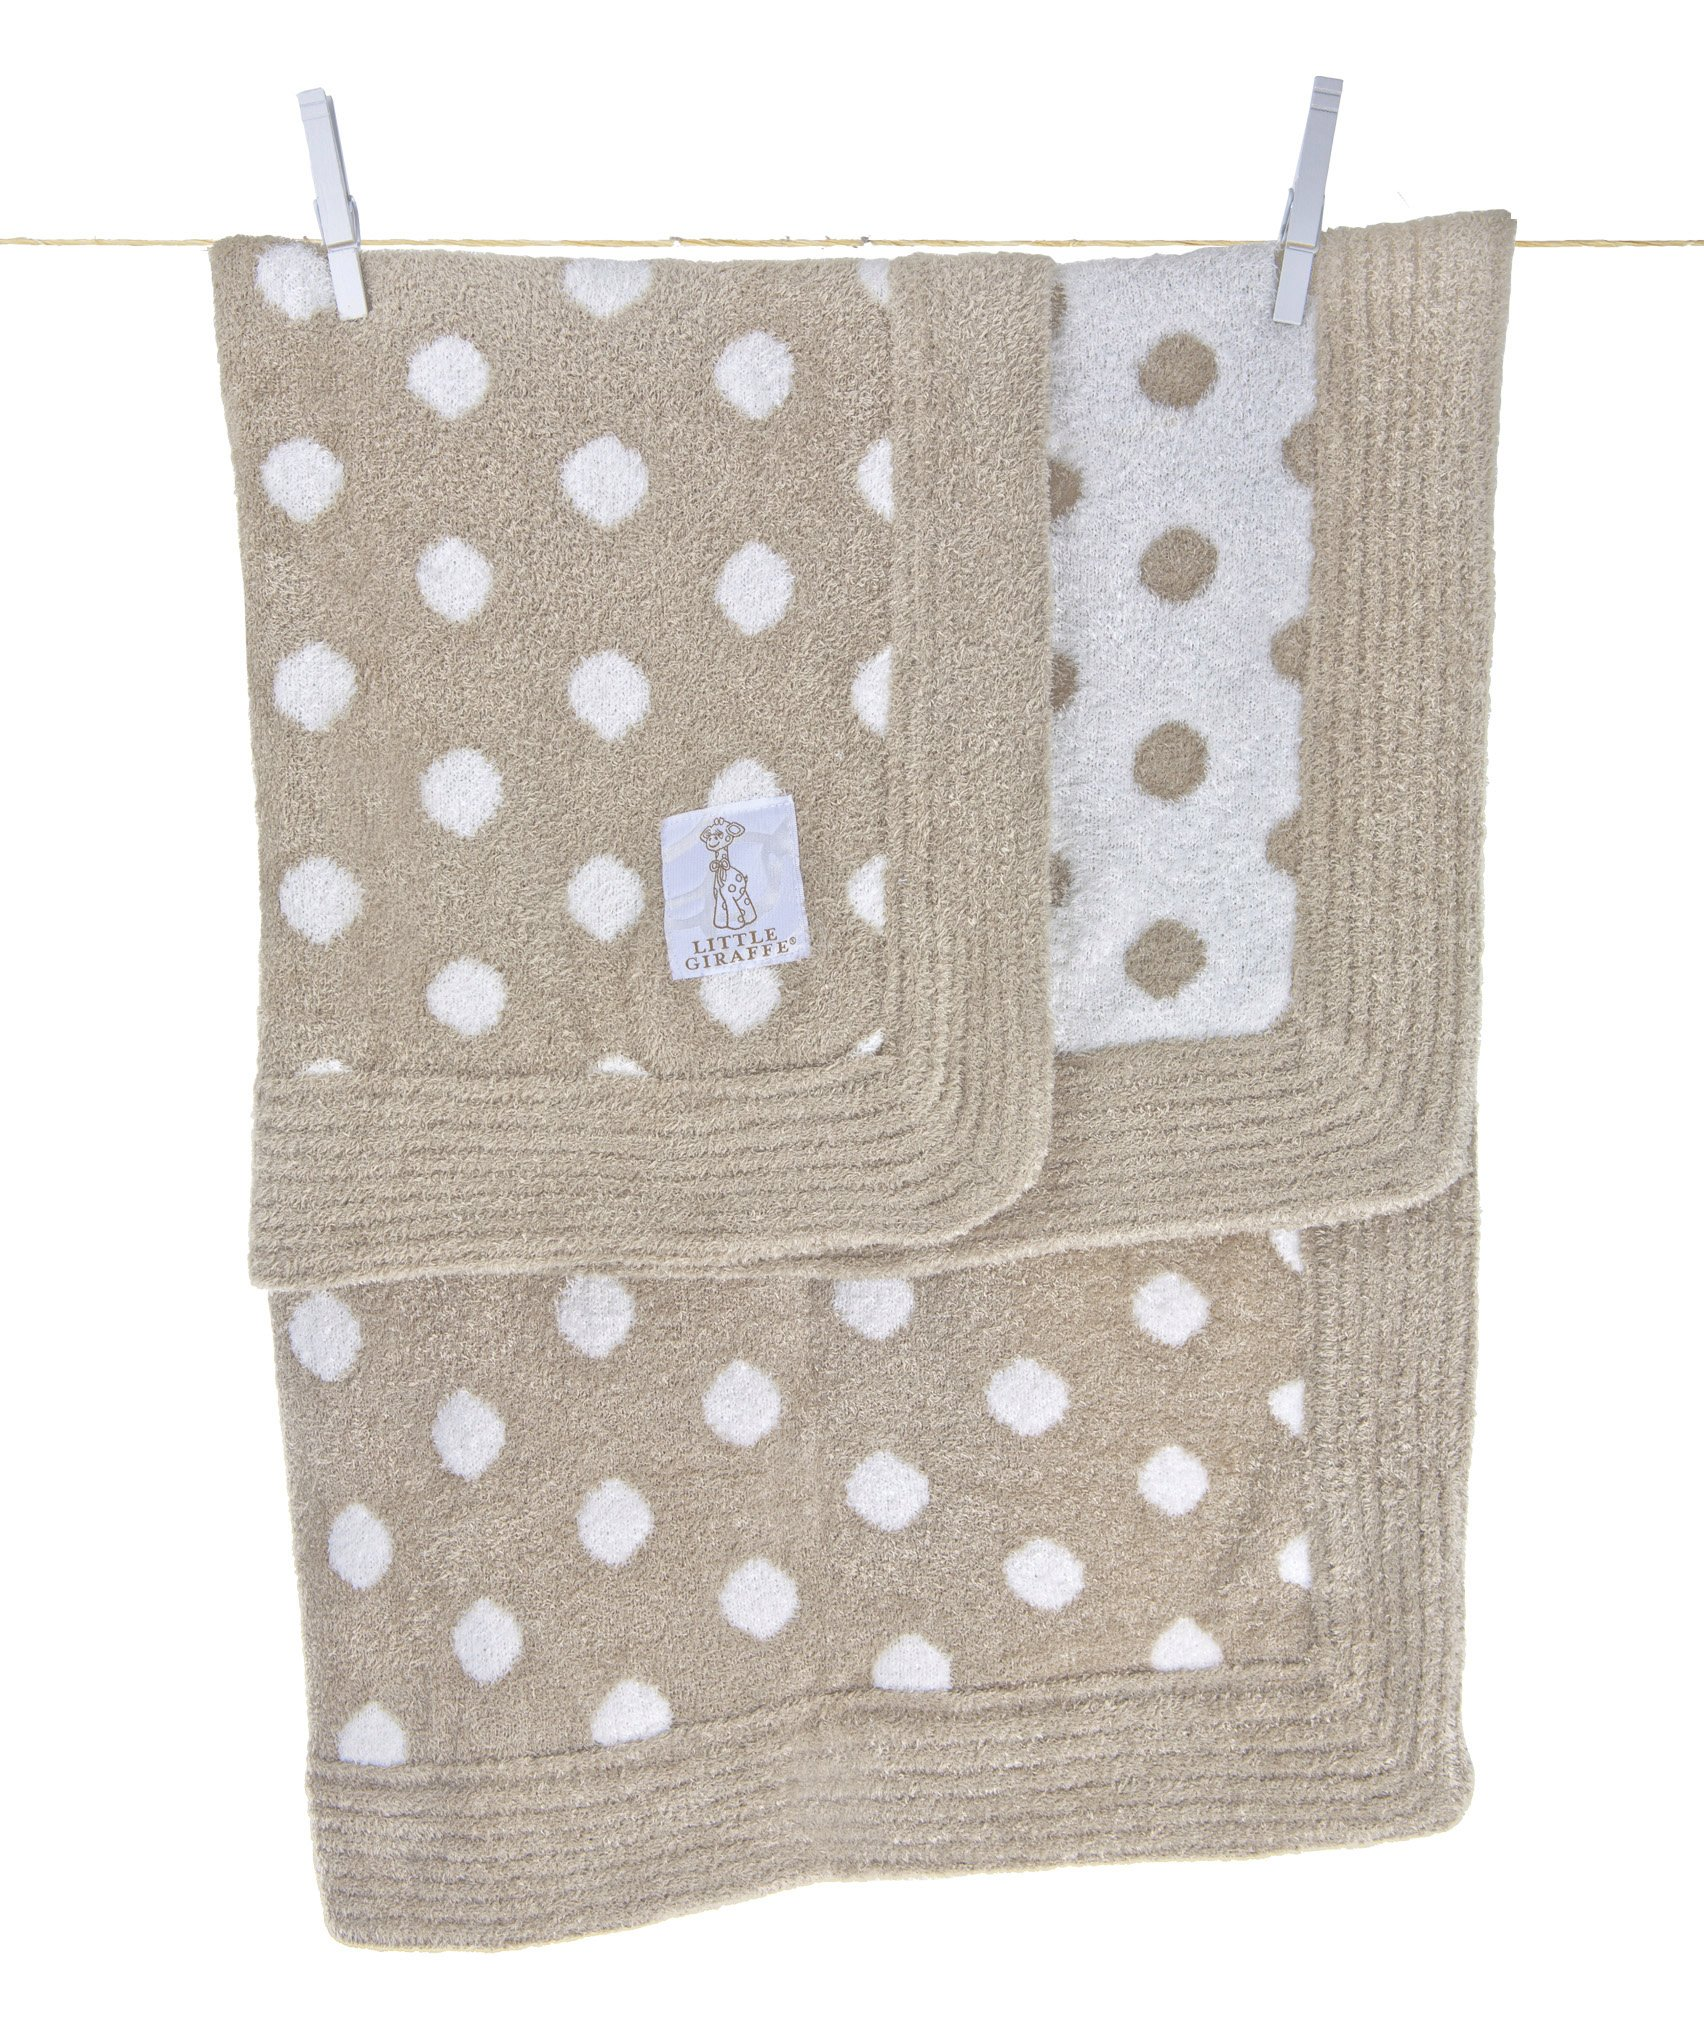 Ritorujirafu Little Giraffe - Dealer imports] Dolce Dot baby blanket (flux) / BOX containing lg0050-03B